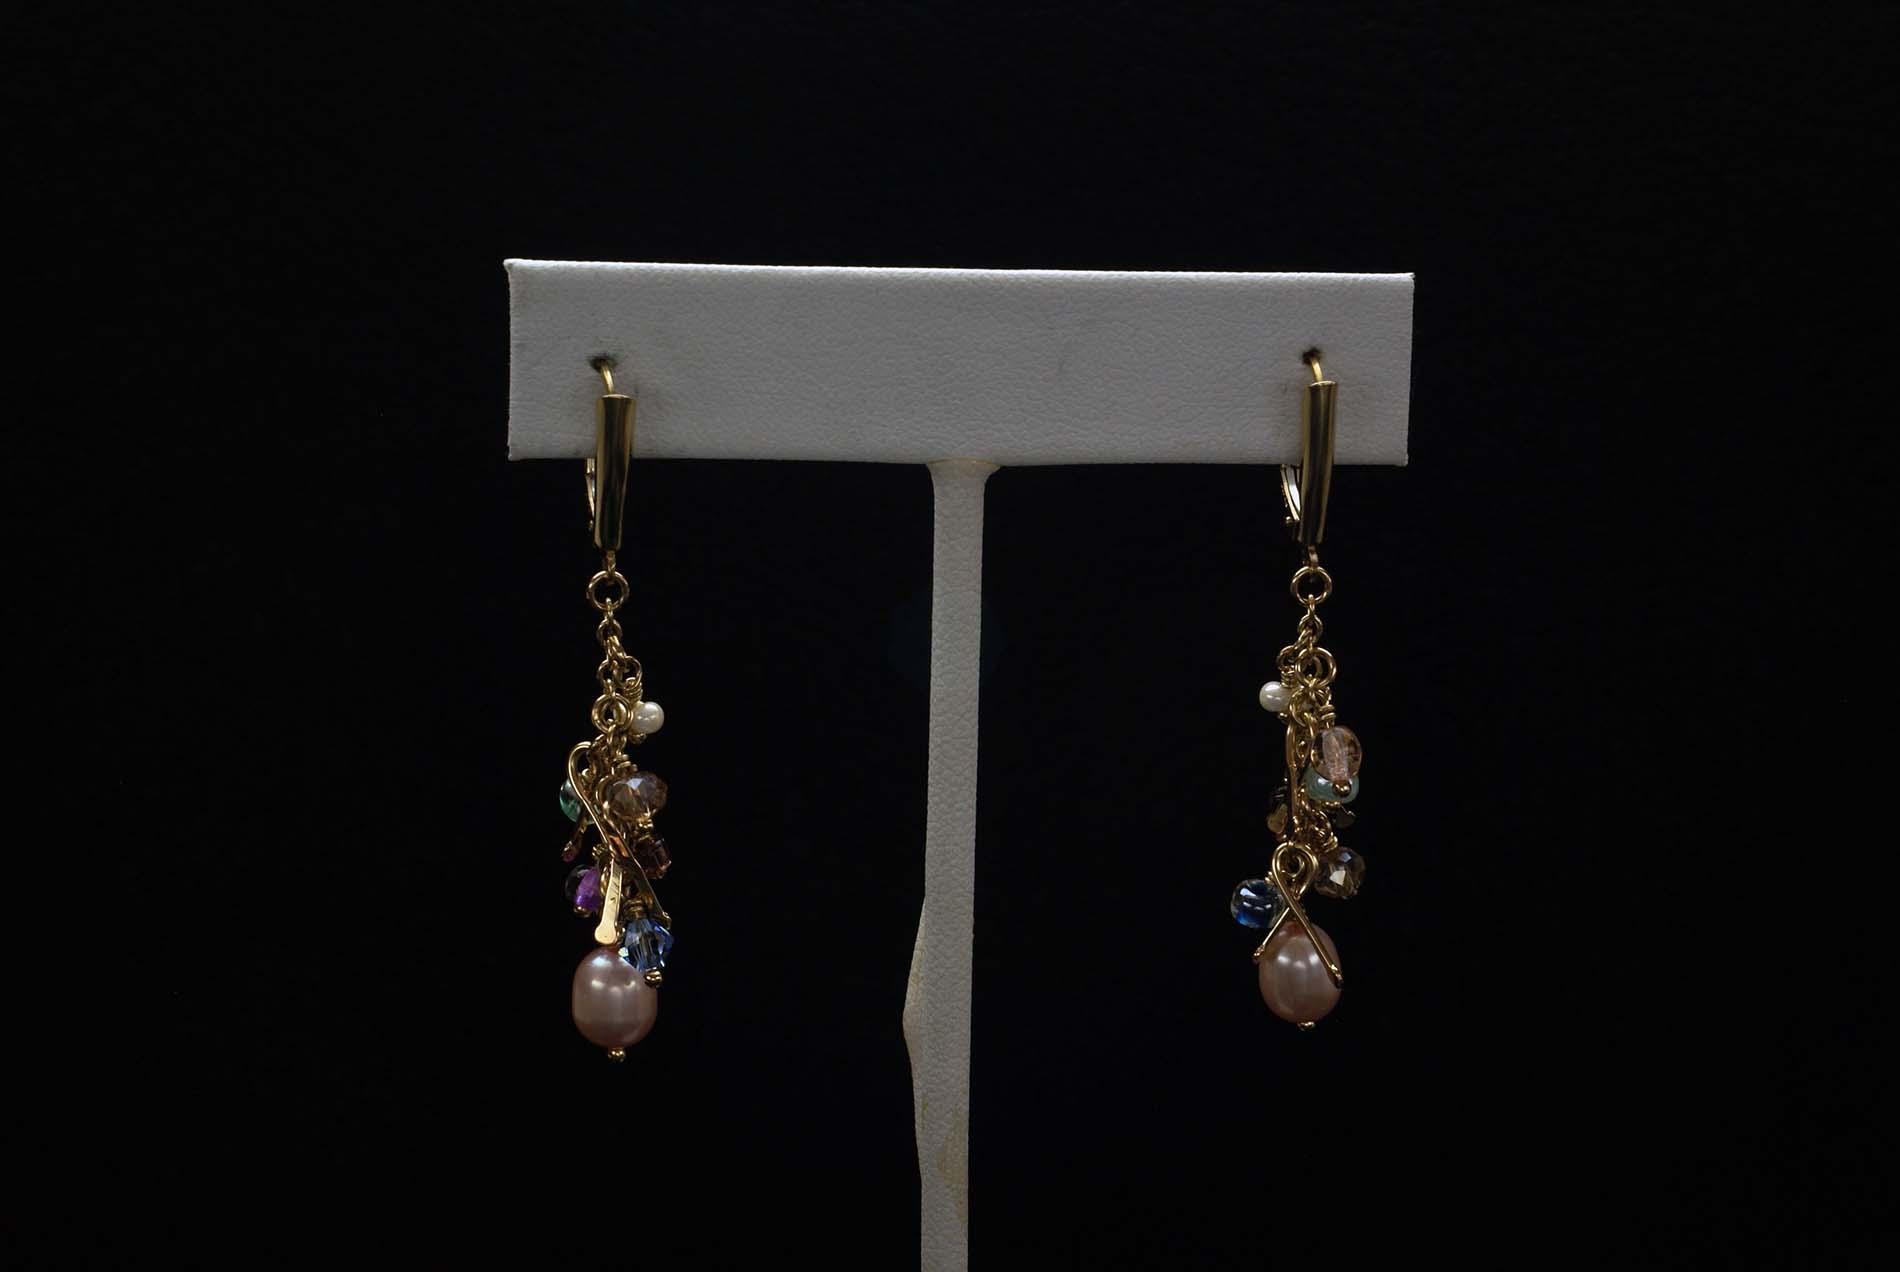 Gold Filled Beads Earrings